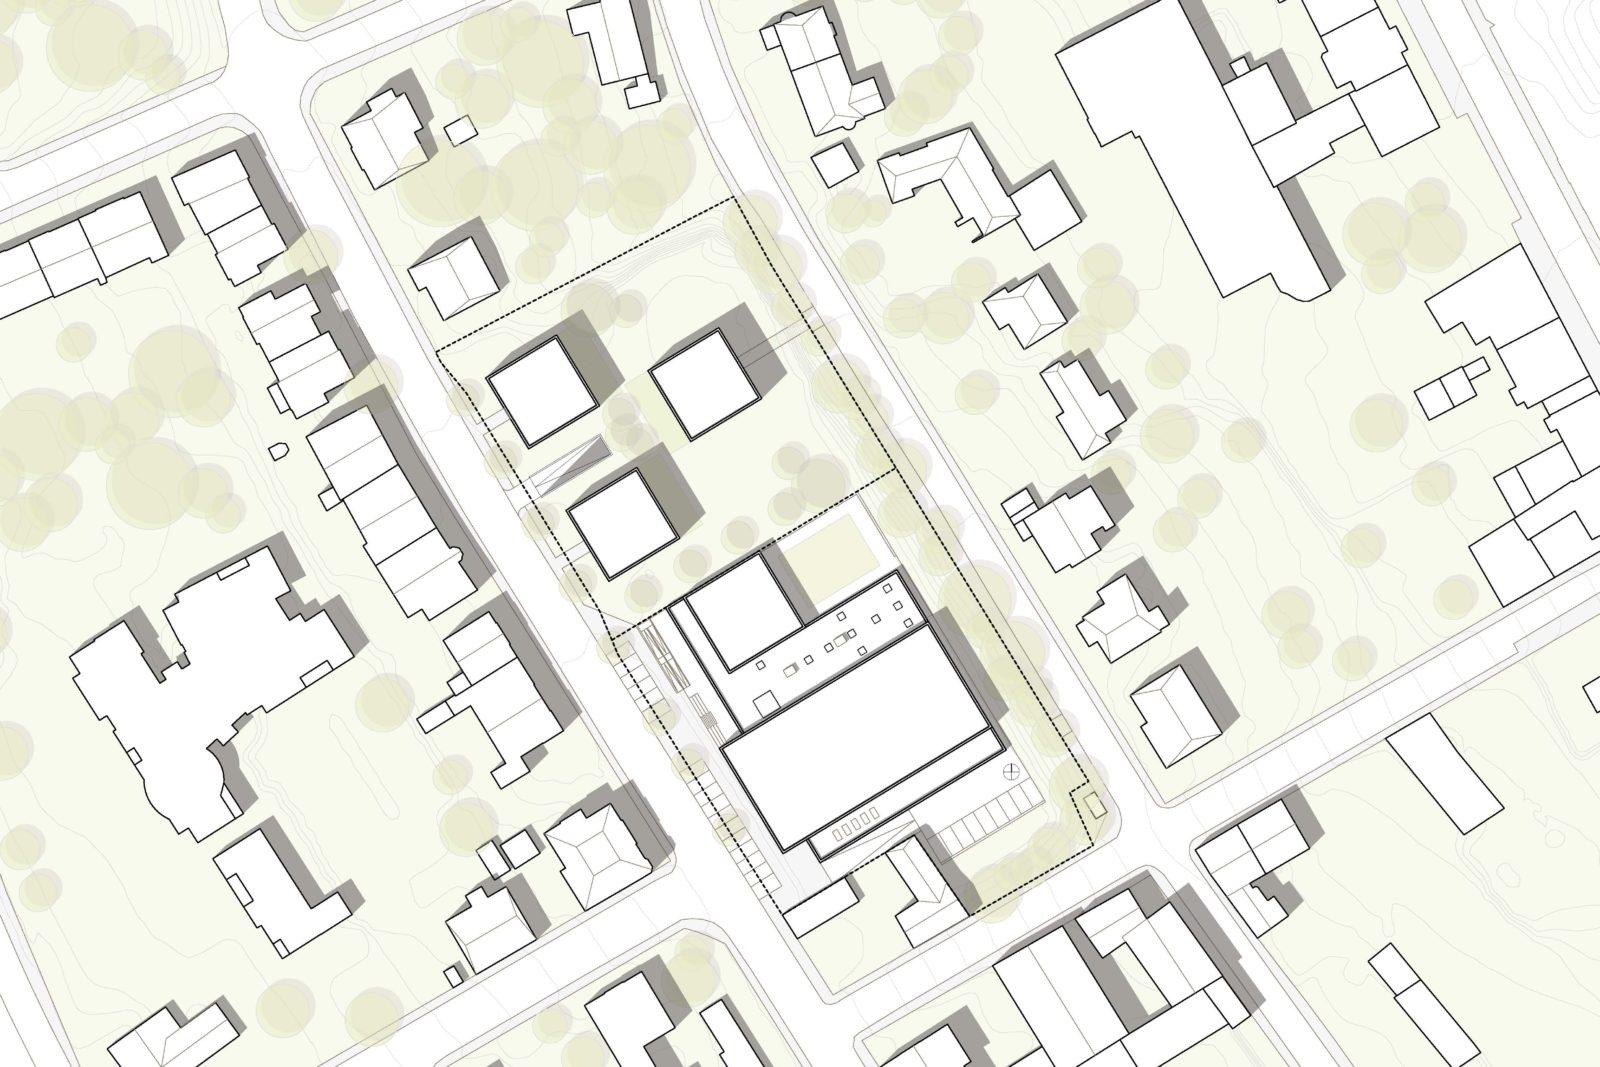 Neubau Sporthalle Pirmasens - Lageplan